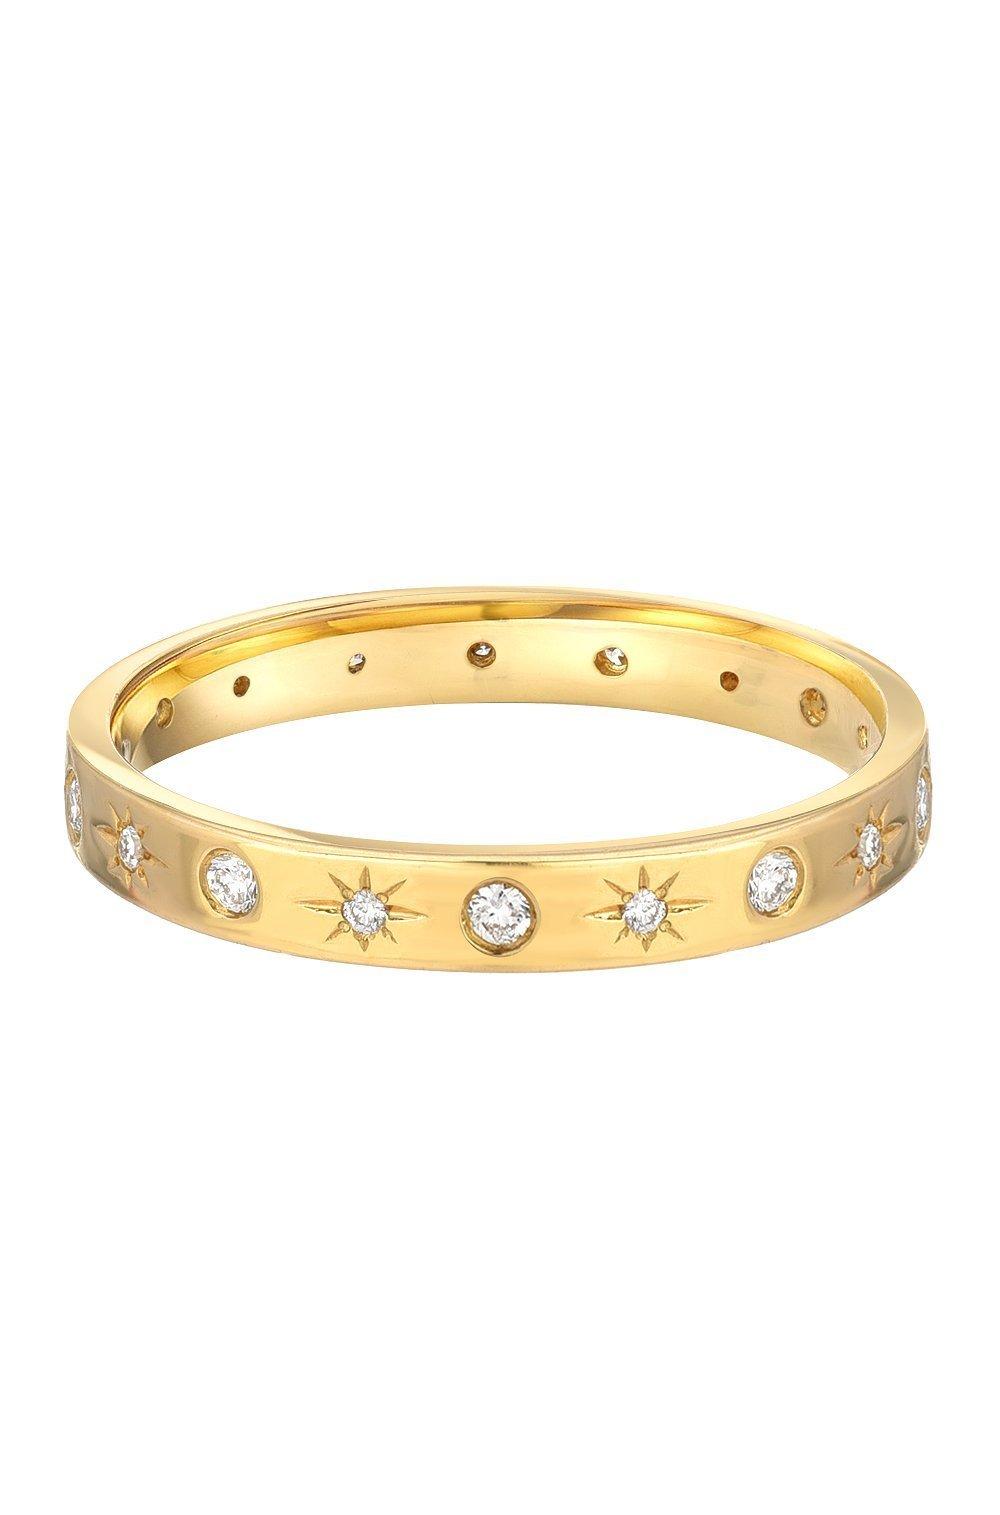 Diamond starburst ring, 14k solid gold